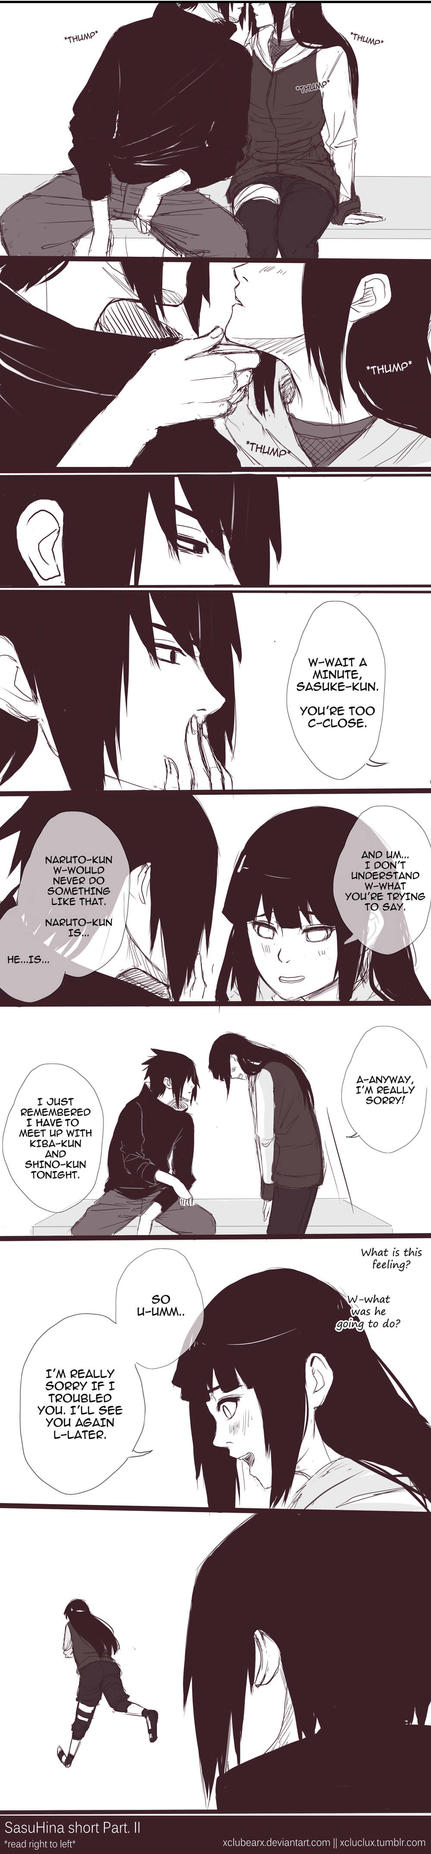 SasuHina Short Doujinshi - [Part II] by xCluBearx